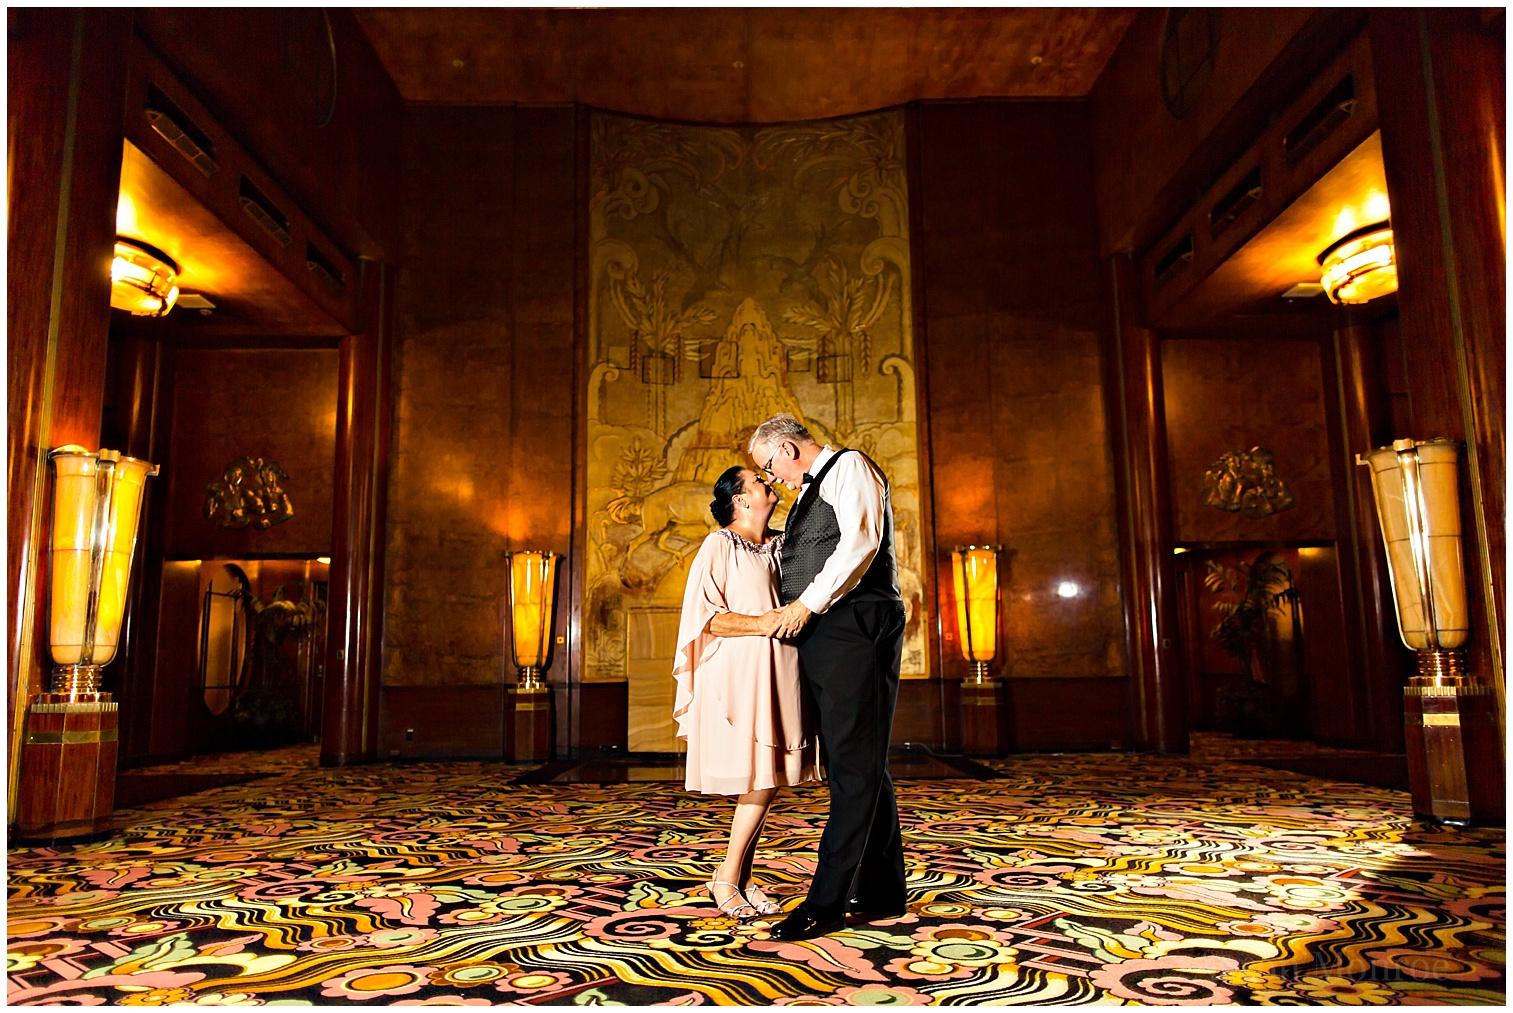 Queen_Mary_Long_Beach_Wedding_Photography_0510.jpg